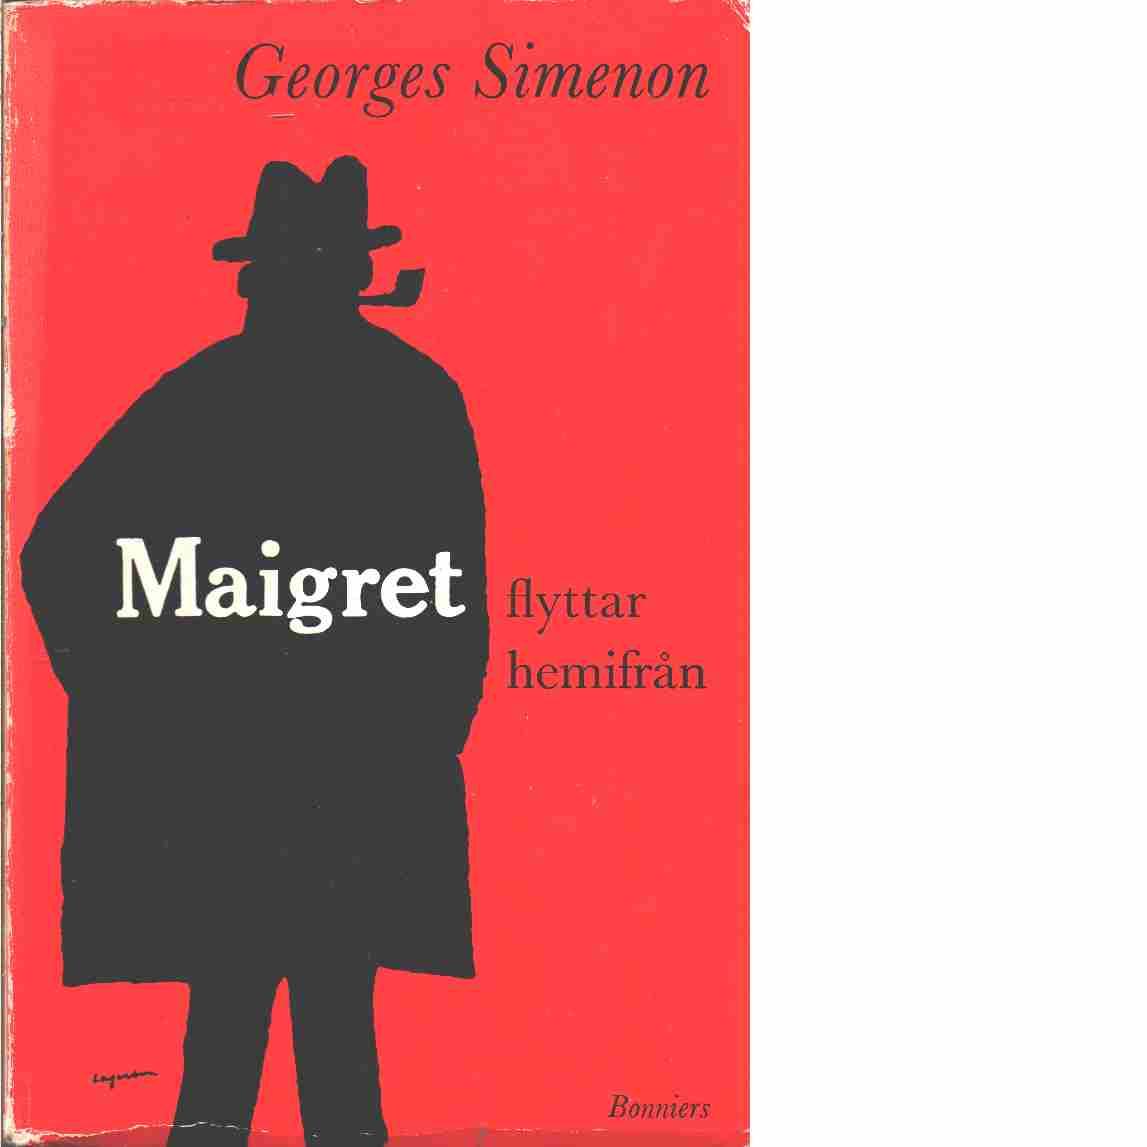 Maigret flyttar hemifrån - Simenon, Georges